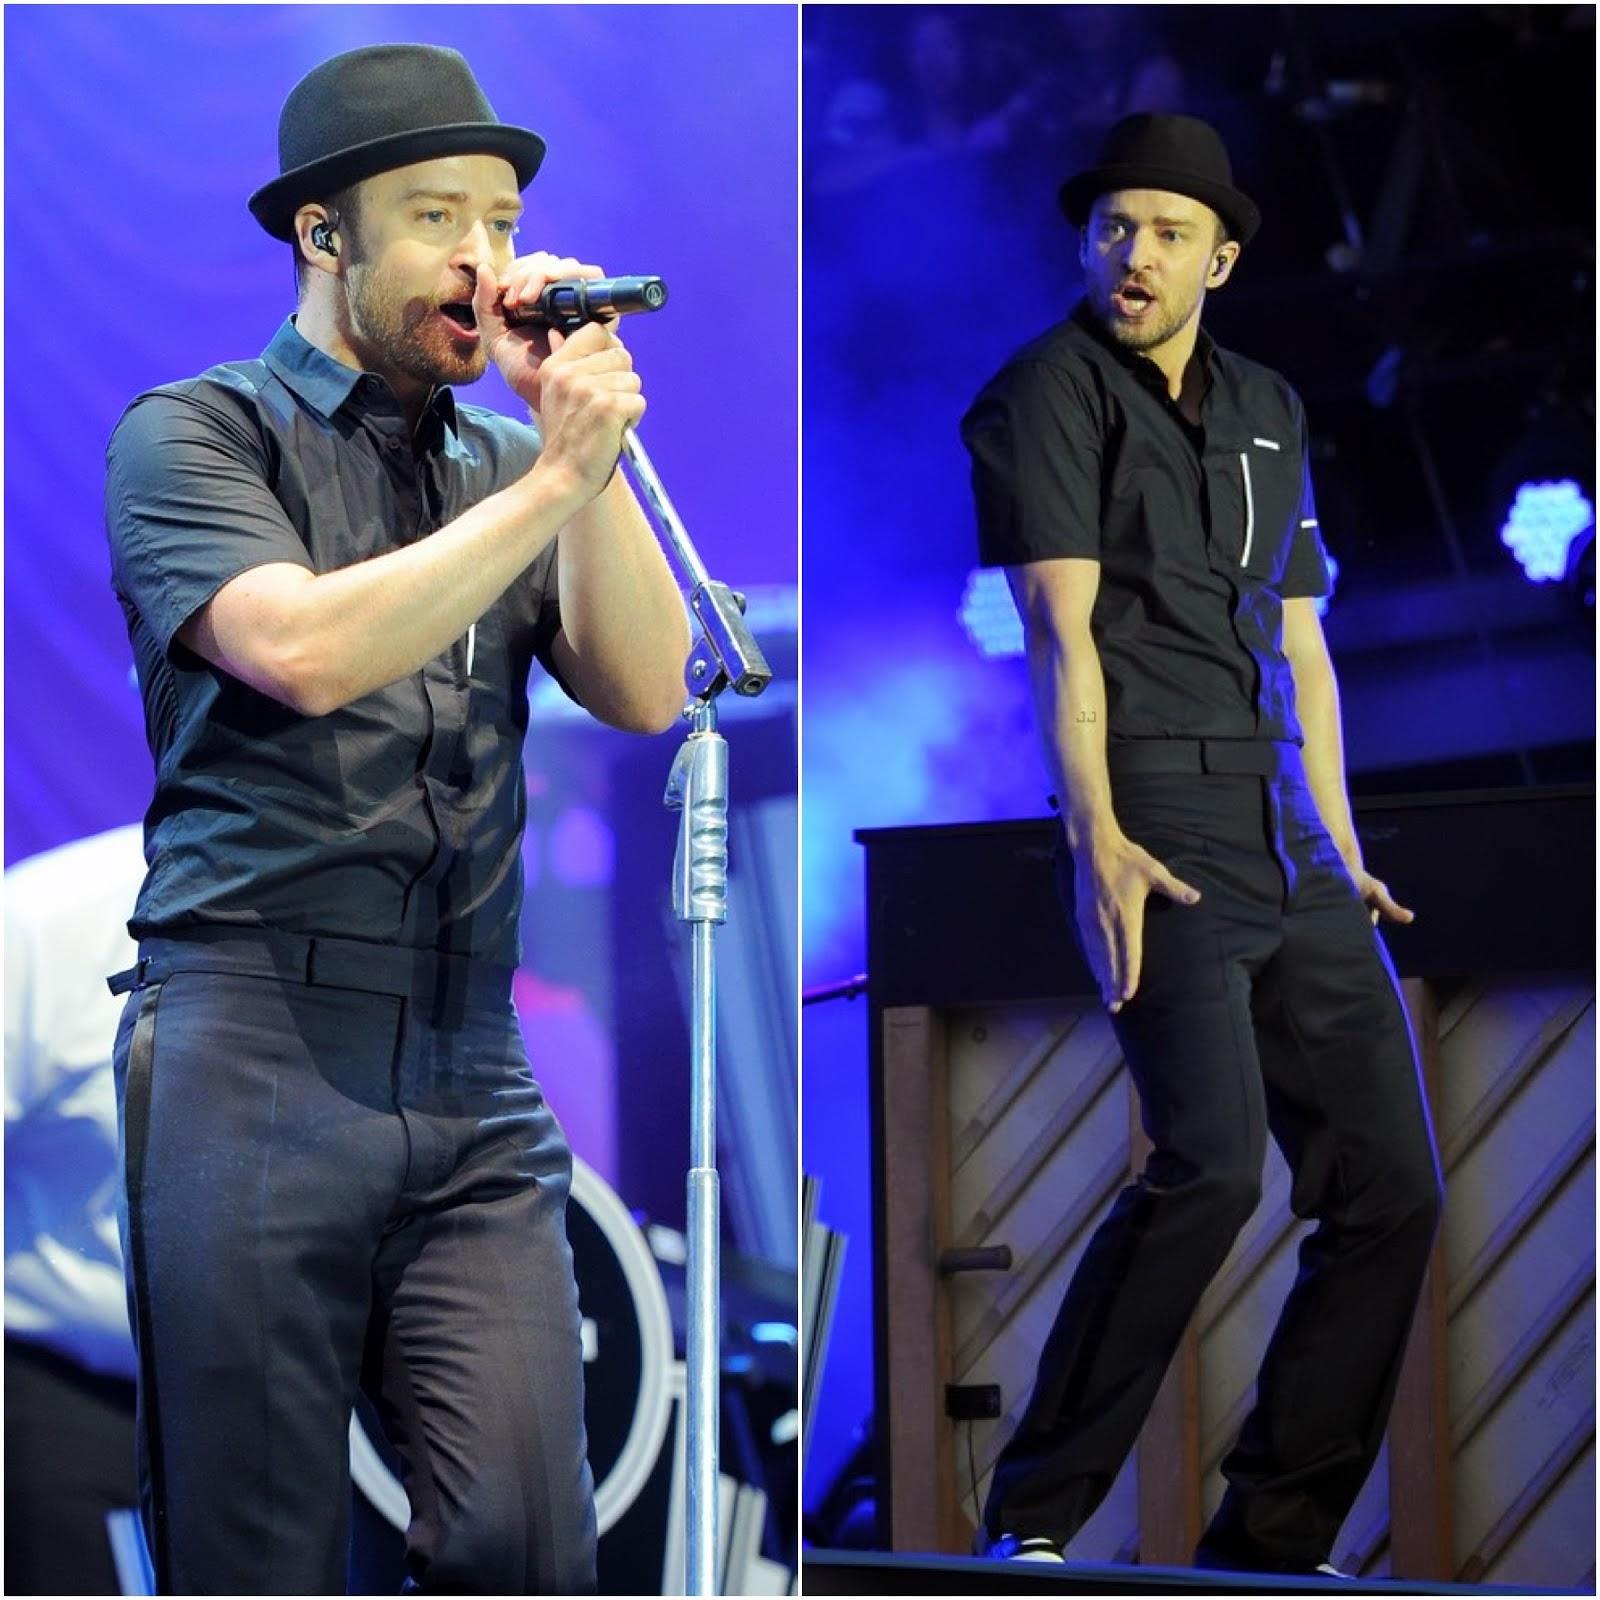 00O00 Menswear Blog: Justin Timberlake in Alexander Wang - Yahoo Wireless Music Festival, London